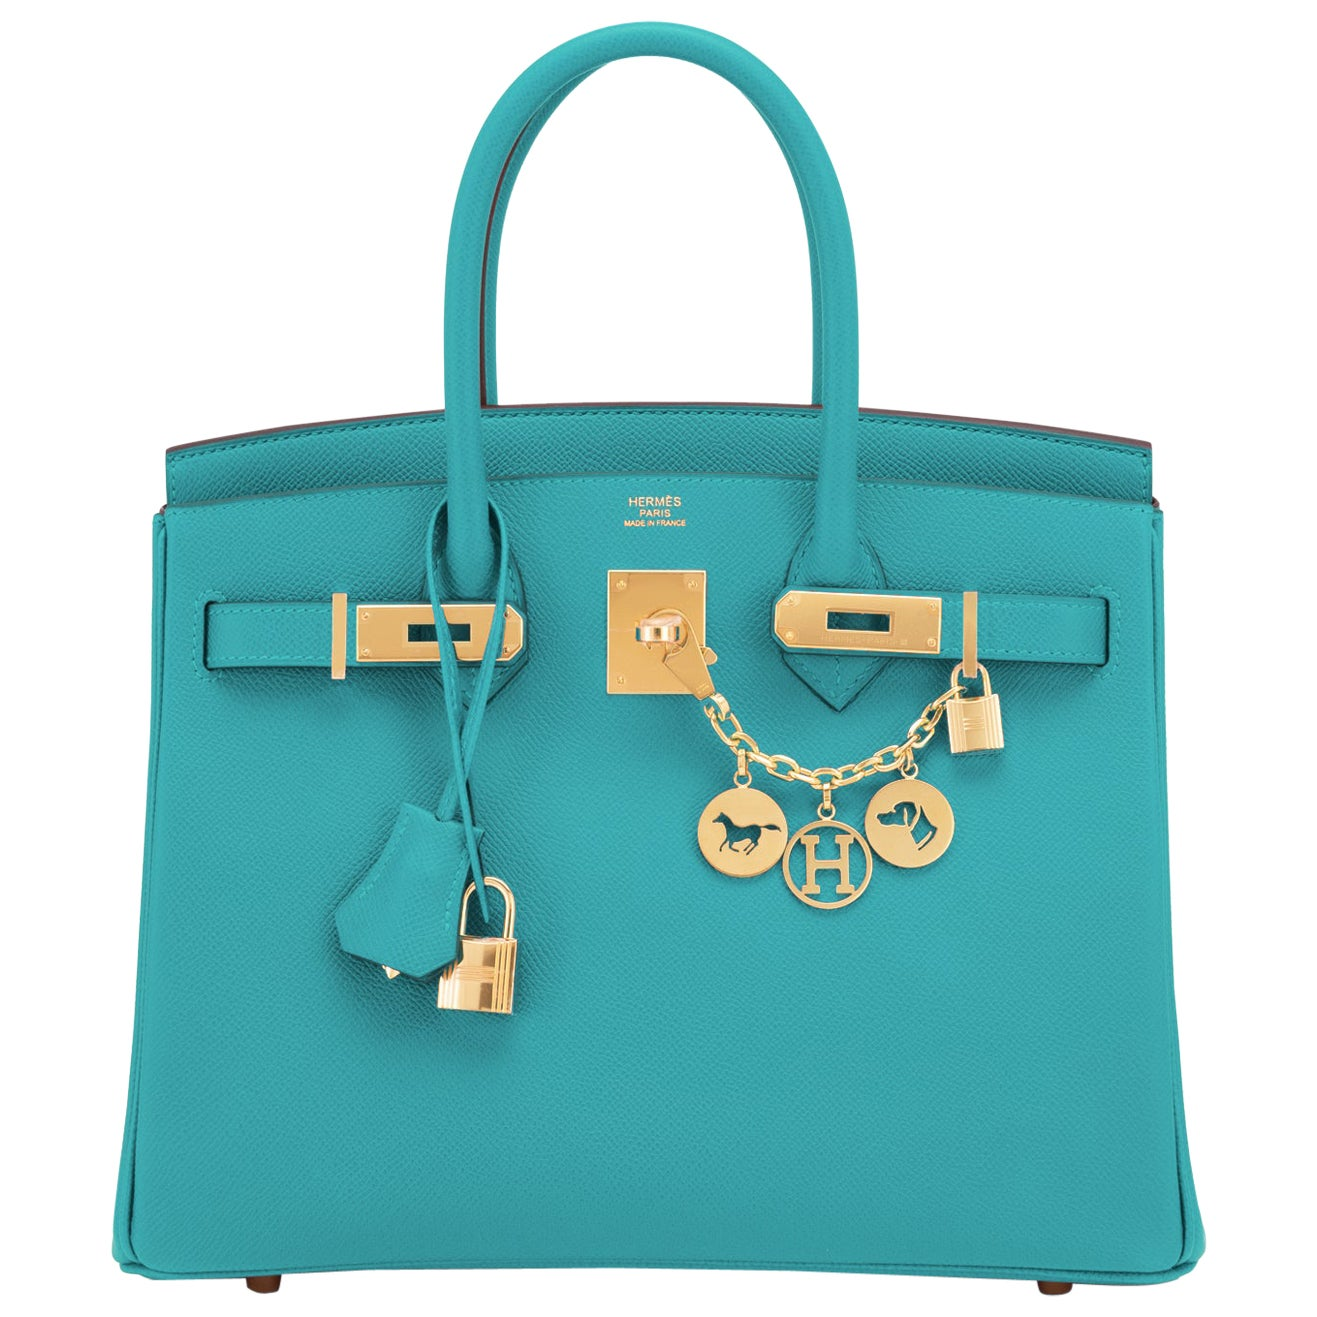 Hermes Birkin 30 Blue Paon Turquoise Peacock Jewel Epsom Gold Bag Y Stamp, 2020